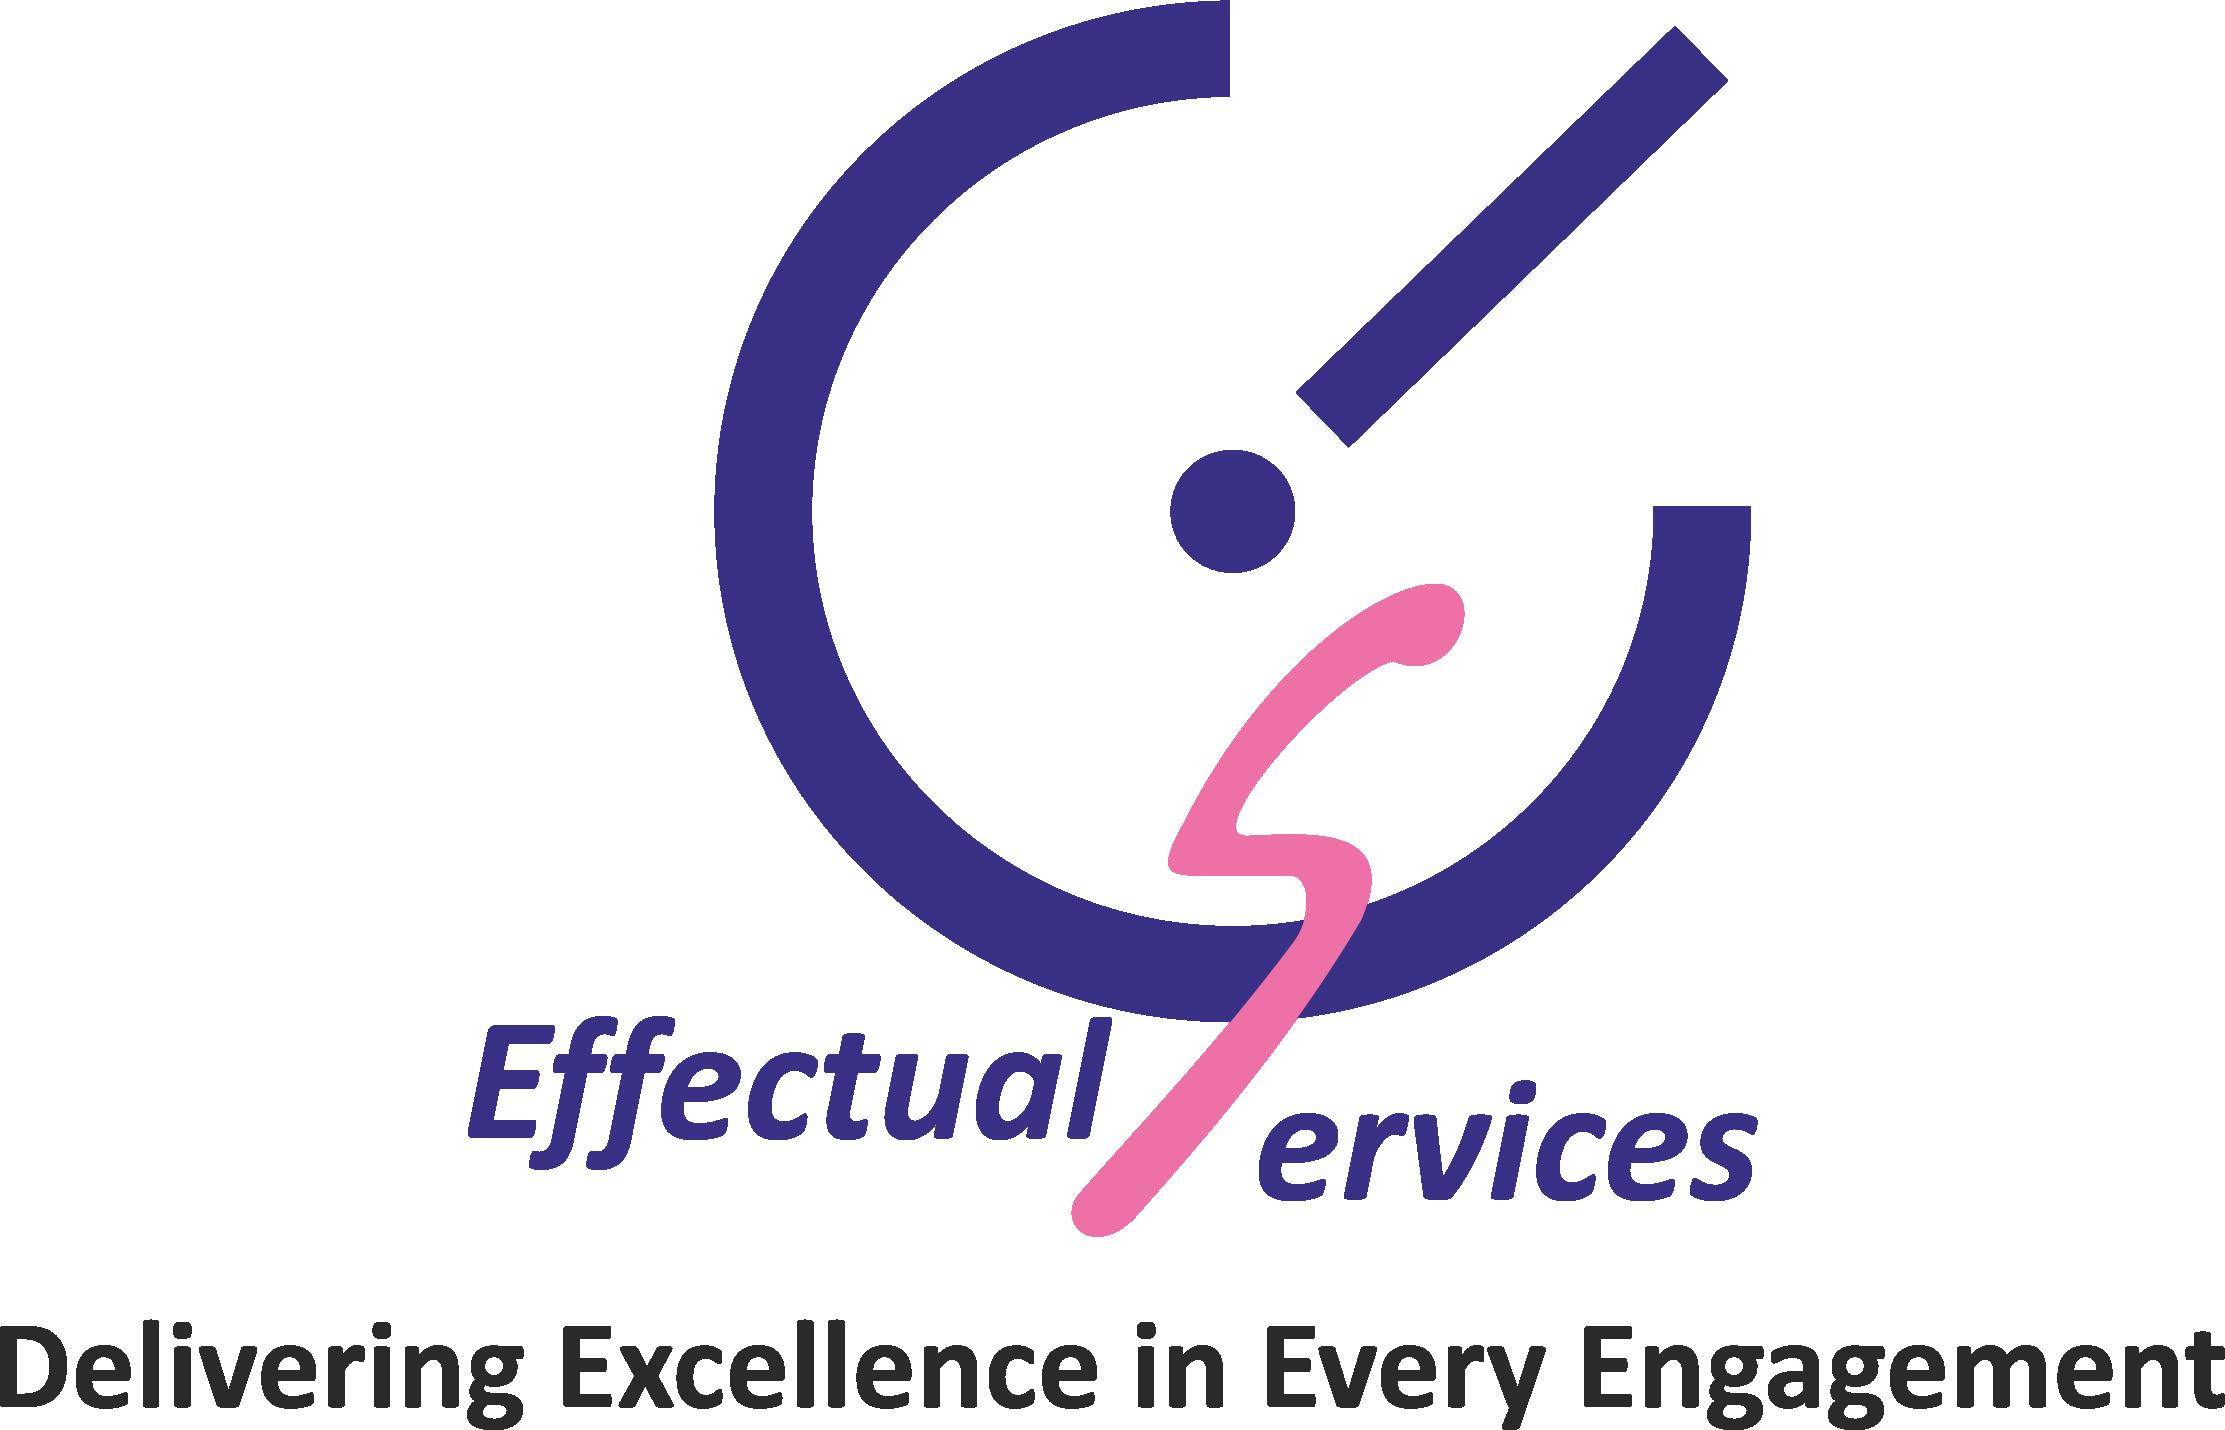 Effectual Services